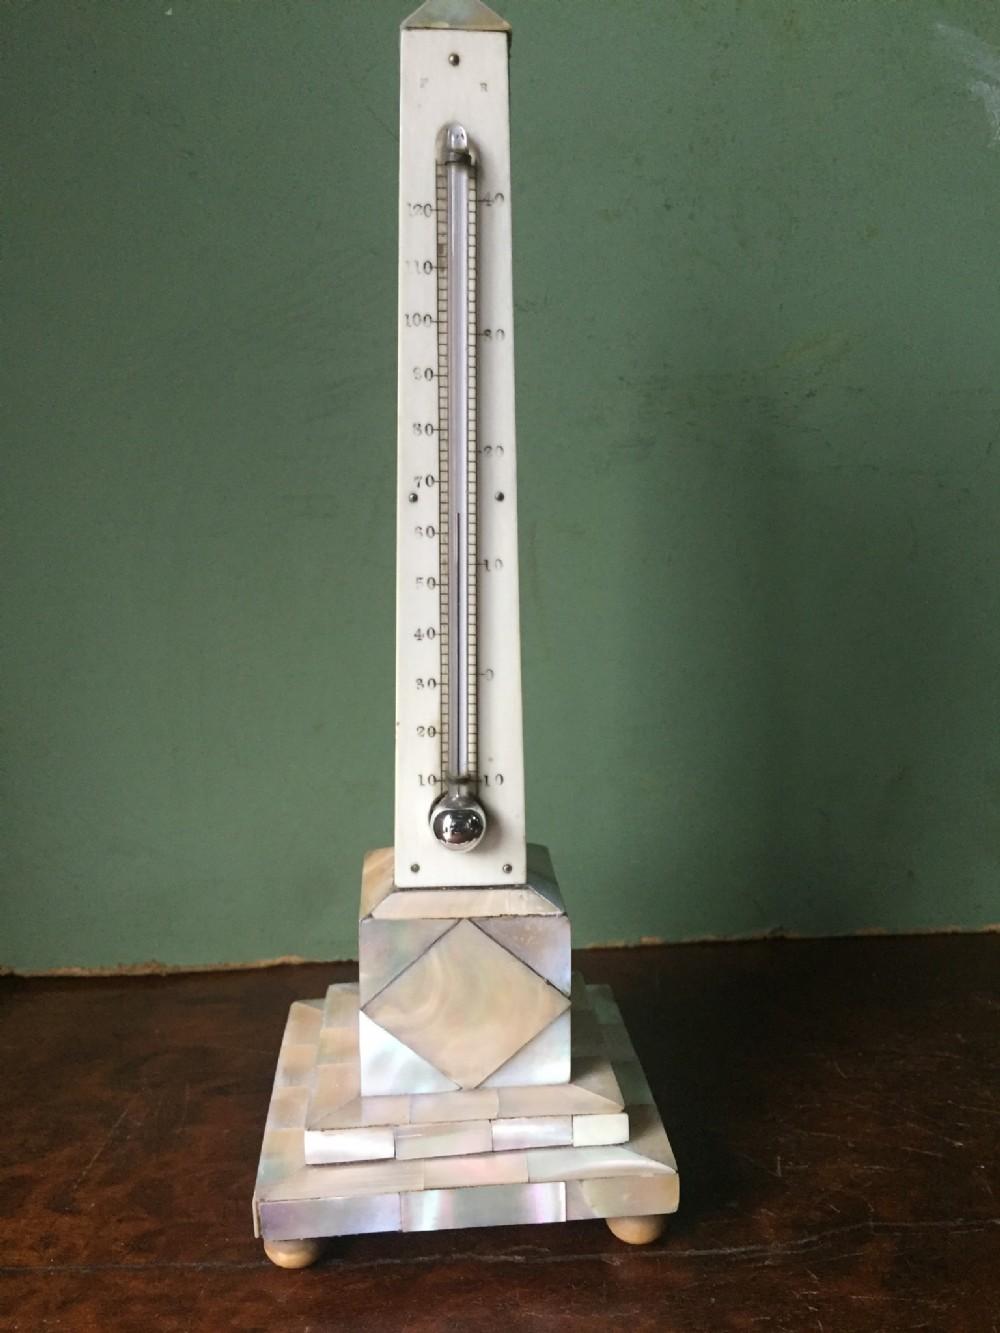 c19th 'mother of pearl' or nacreshell veneered desktop obelisk thermometer